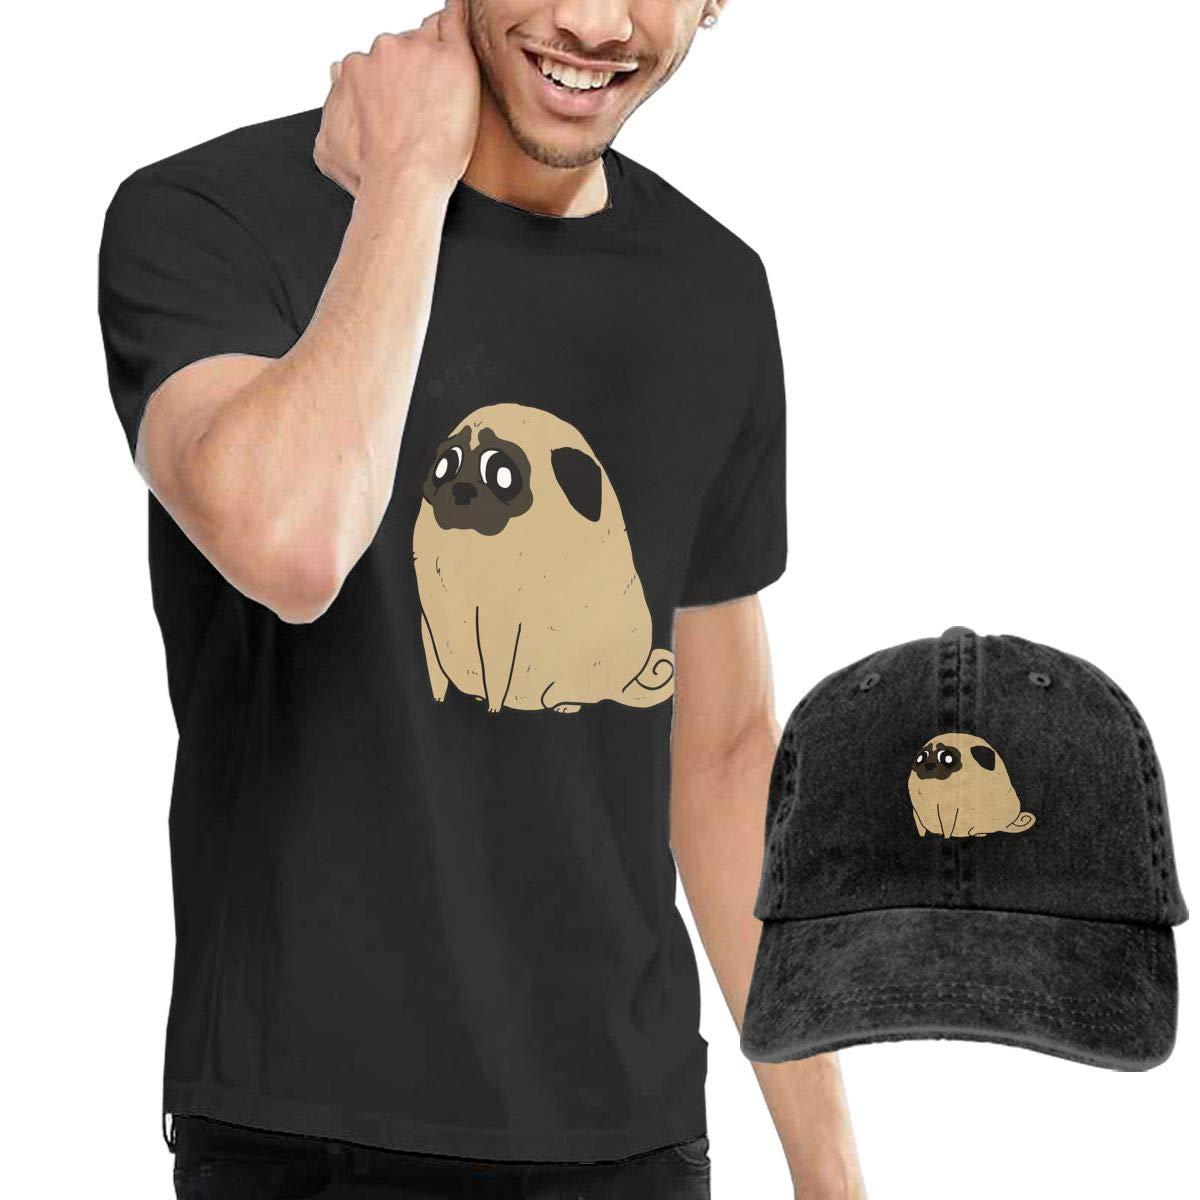 QqZXD Pugtato Fashion Mens T-Shirt and Hats Youth /& Adult T-Shirts